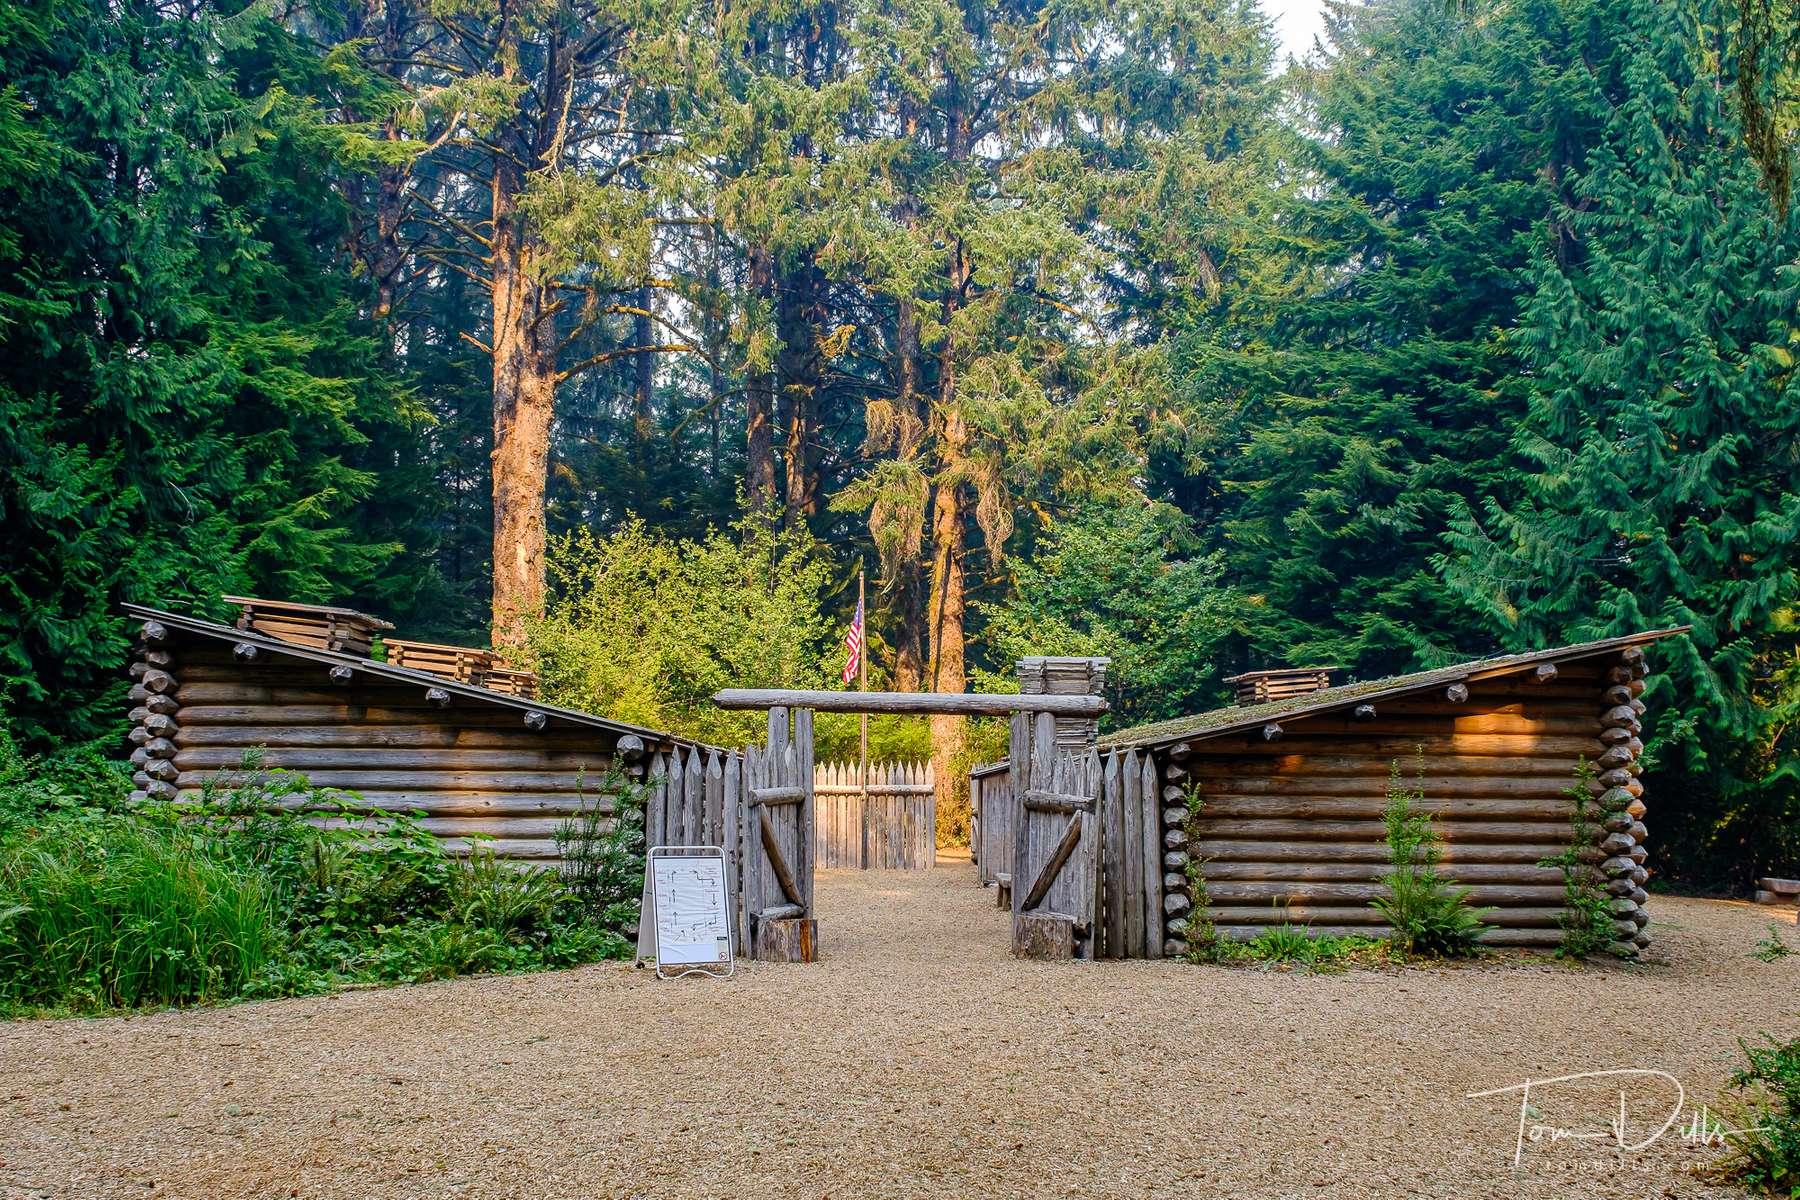 Fort Clatsop, part of Lewis & Clark National Historical Park near Astoria, Washington